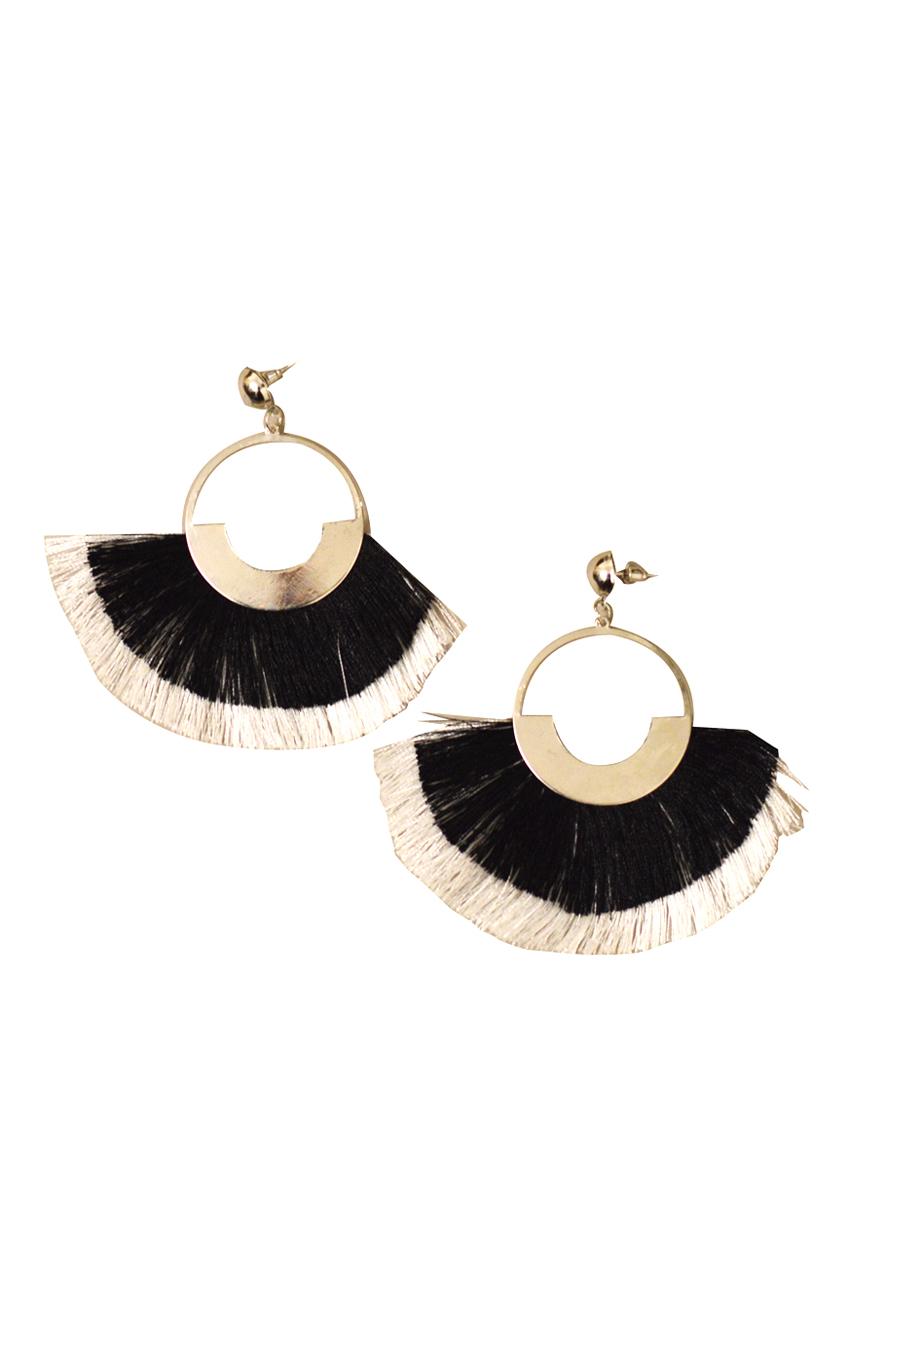 b1a52df3a Buy Contemporary Drop Earrings for Women Online in India   Kovet.in